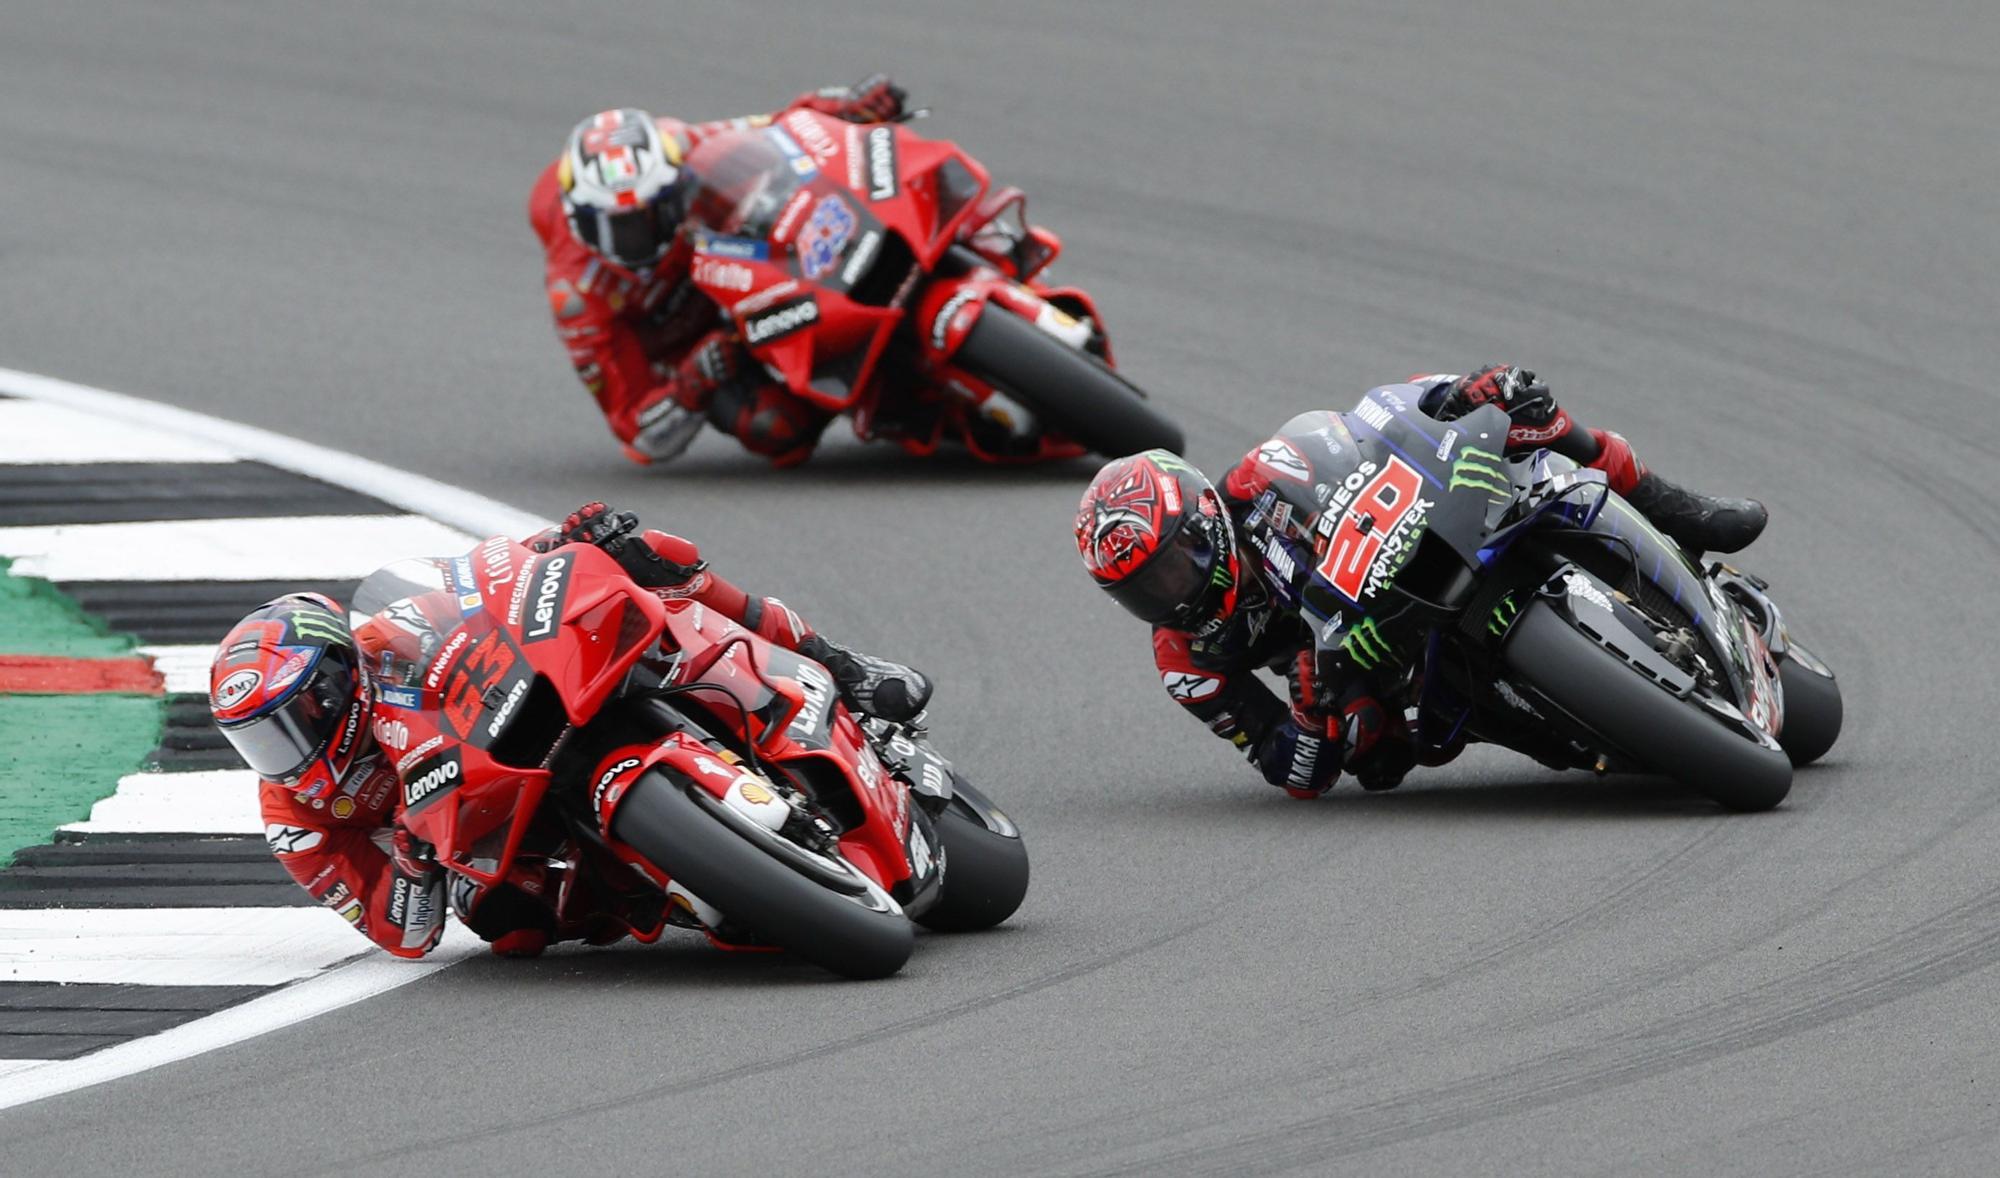 Gran Premio de Gran Bretaña de Moto GP